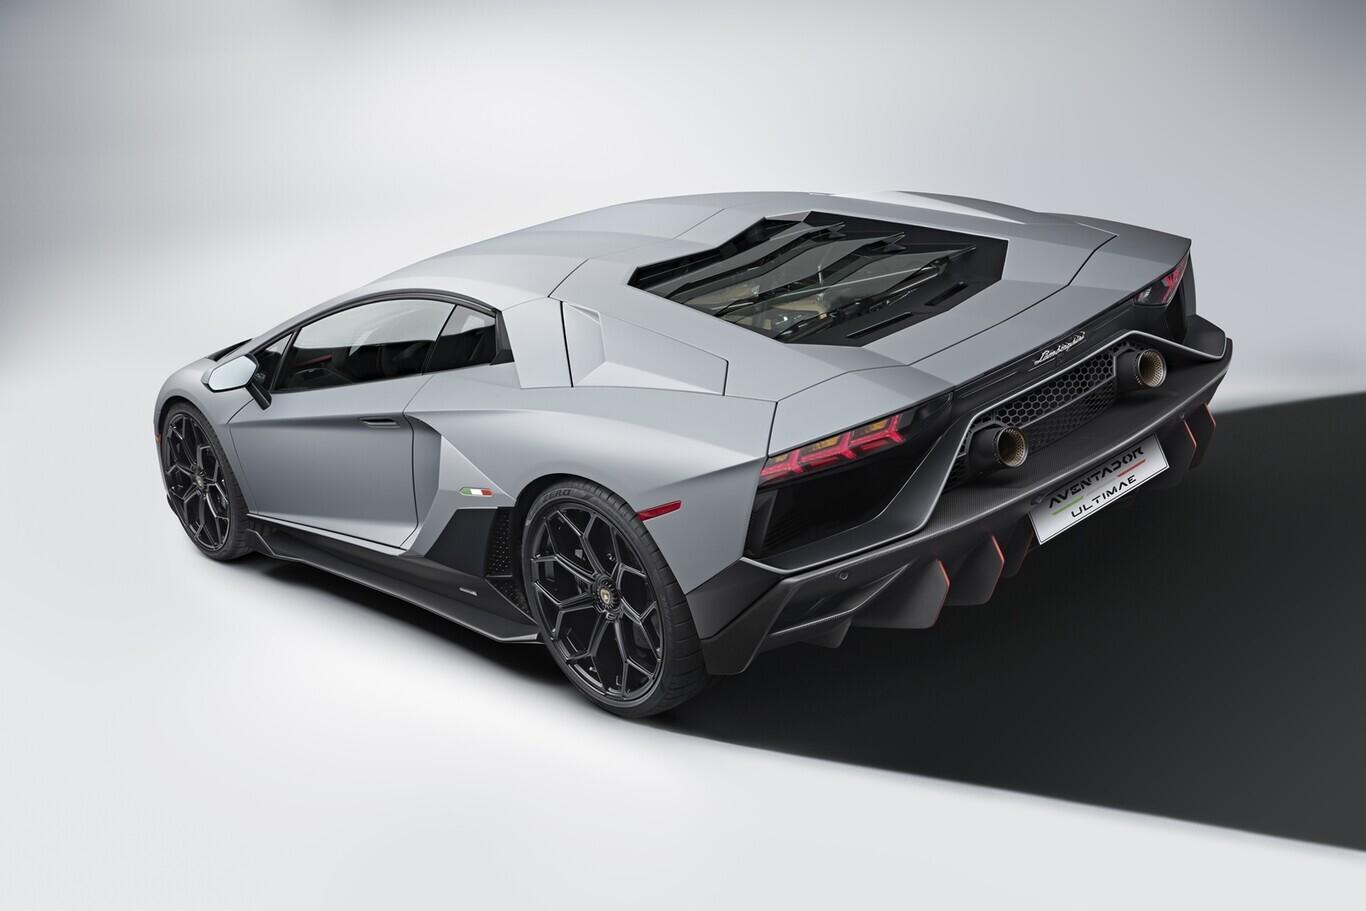 Foto de Lamborghini Aventador LP780-4 Ultimae (14/18)